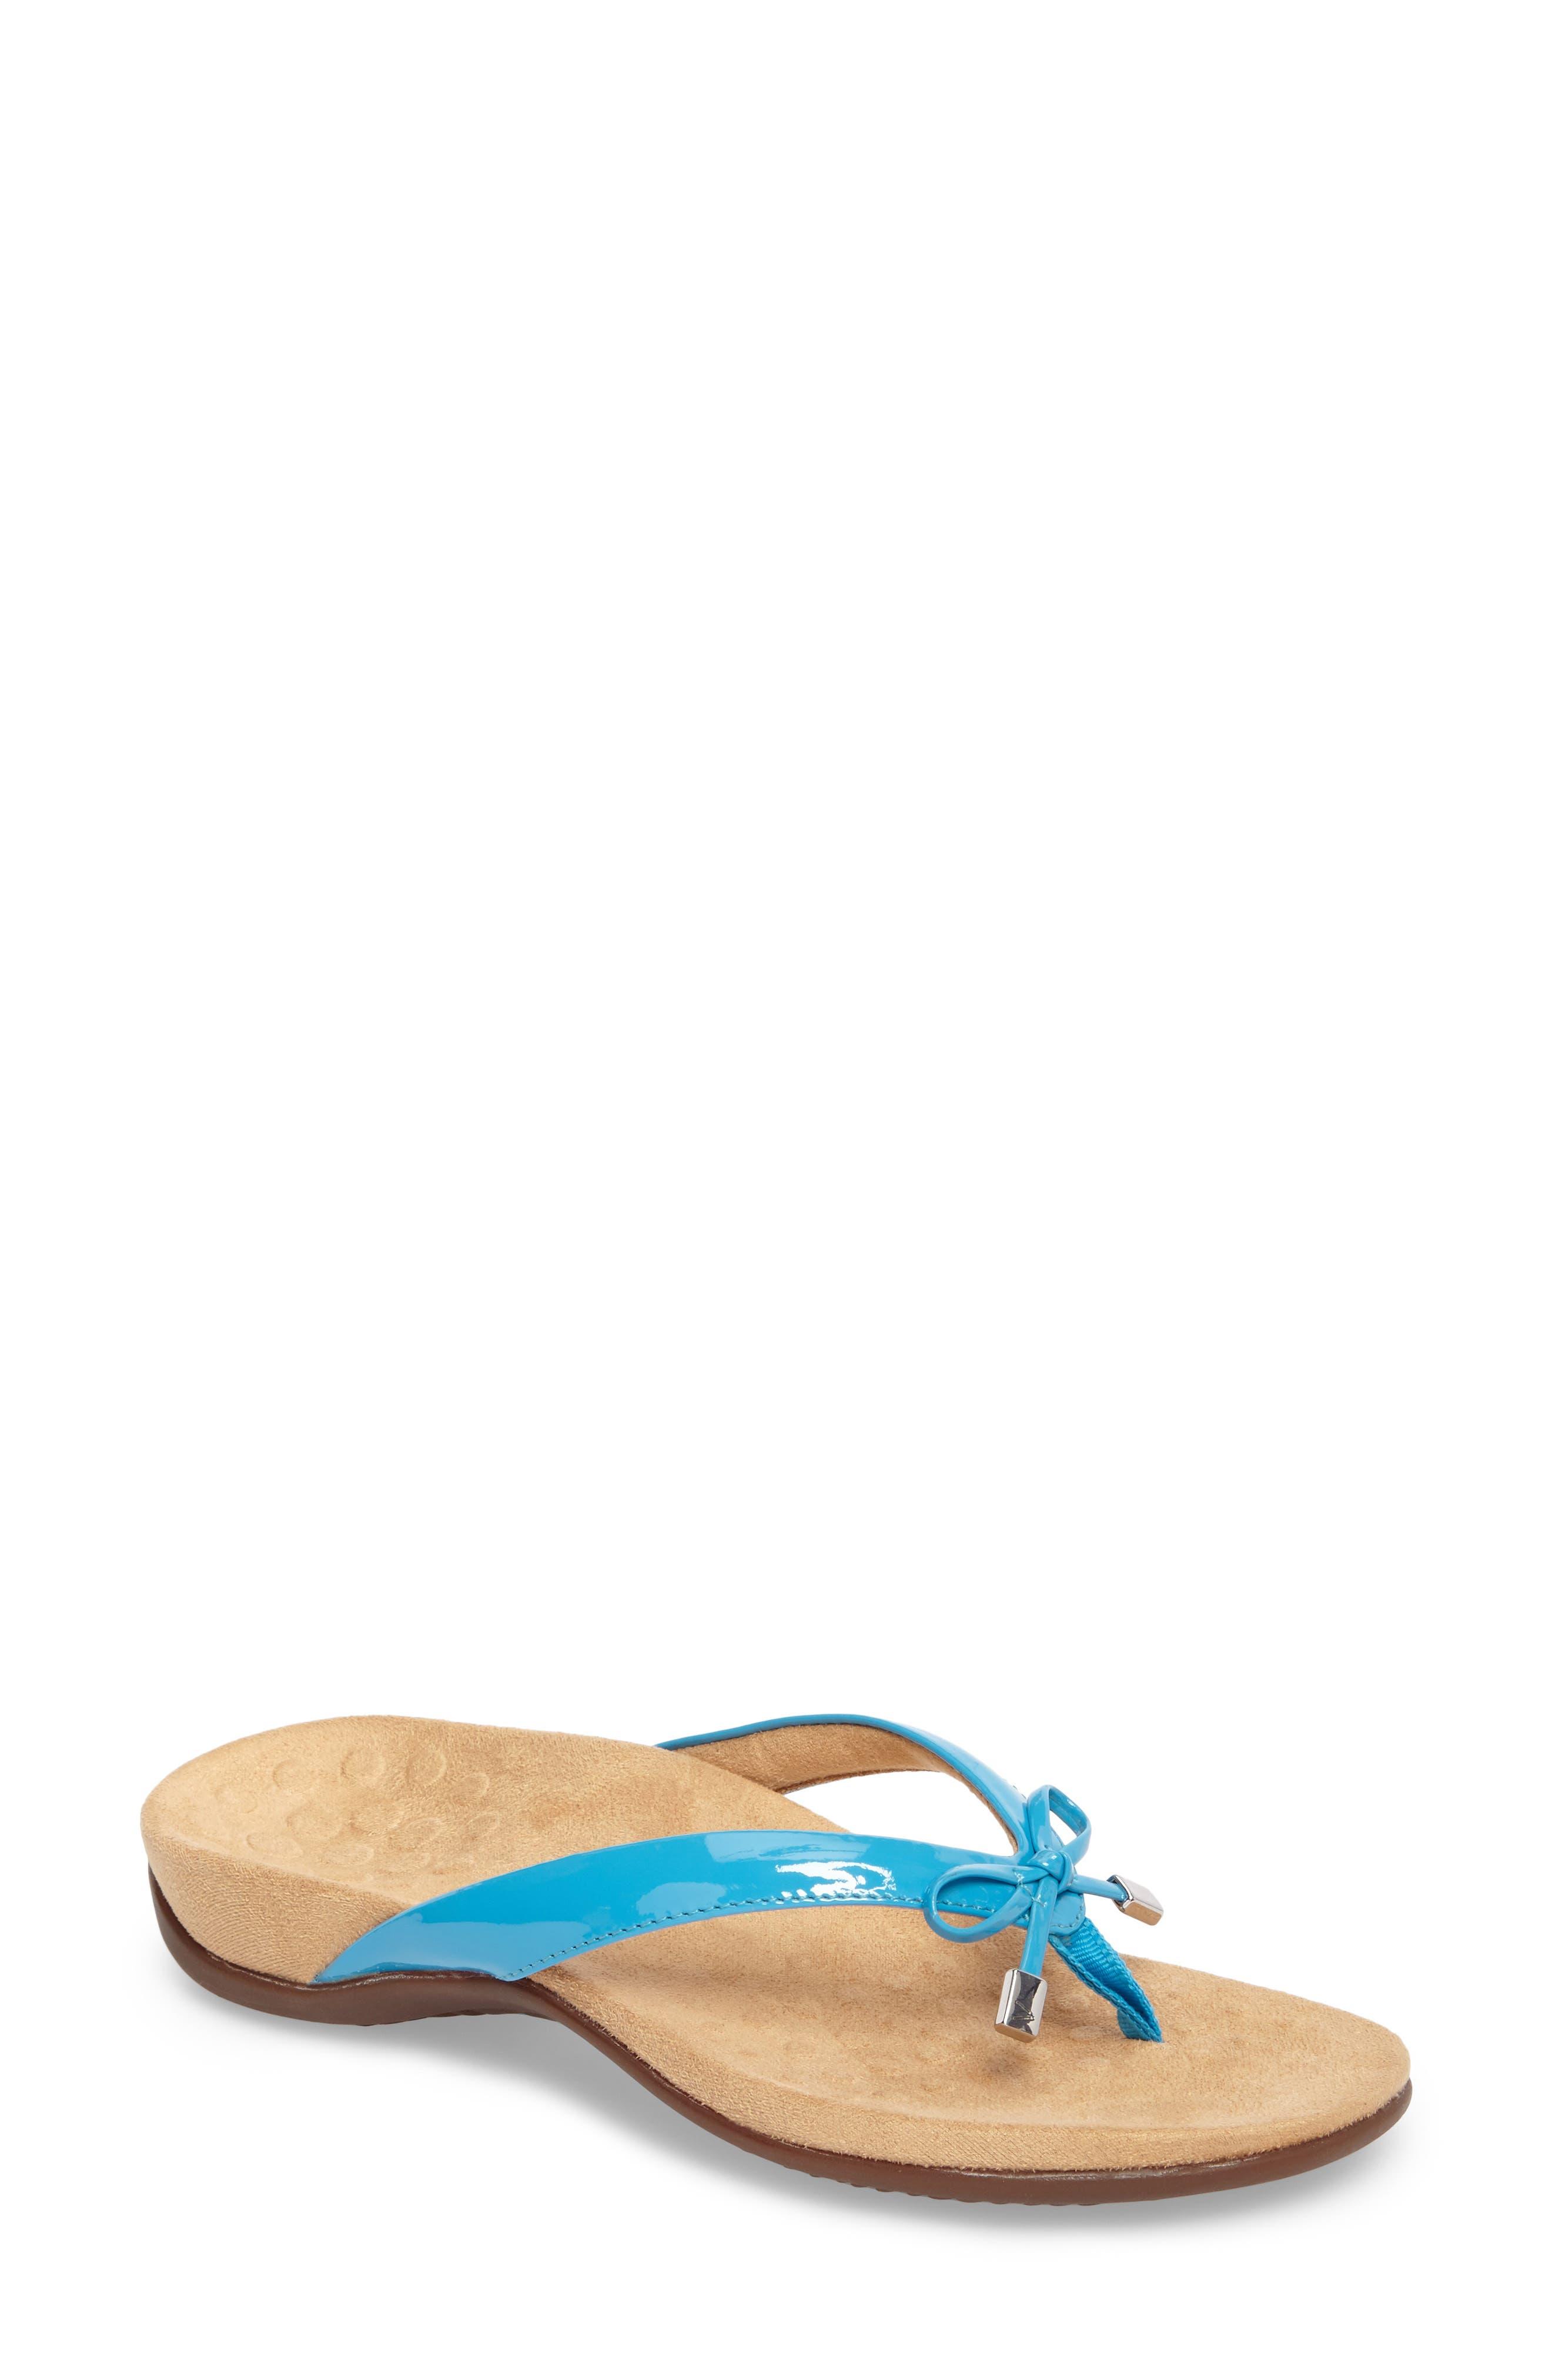 Alternate Image 1 Selected - Vionic 'Bella II' Sandal (Women)